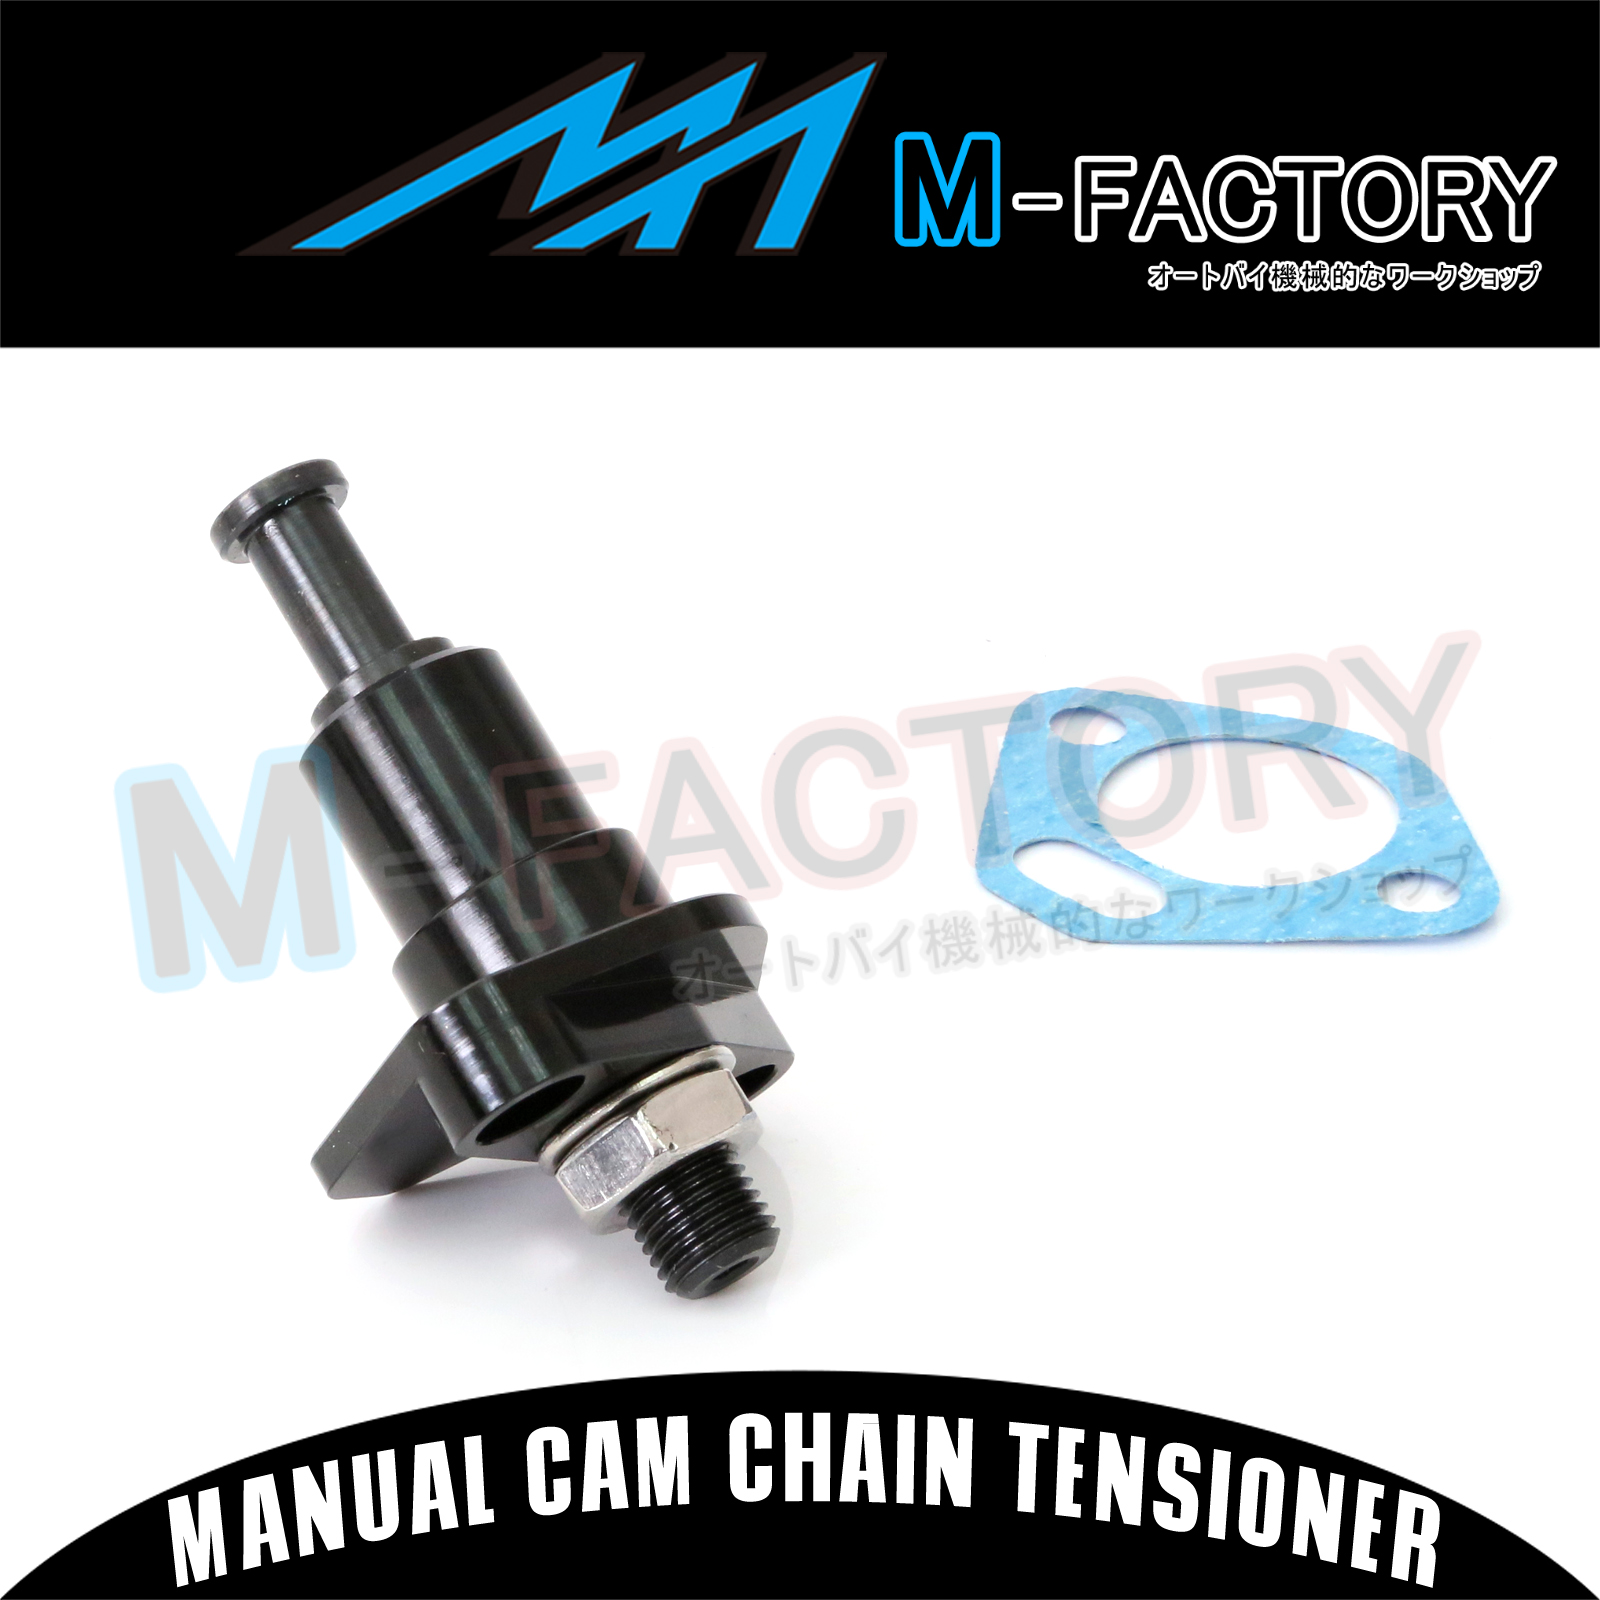 Black CNC Manual Cam Chain Tensioner For Kawasaki KX250F 04-08 04 05 06 07 08